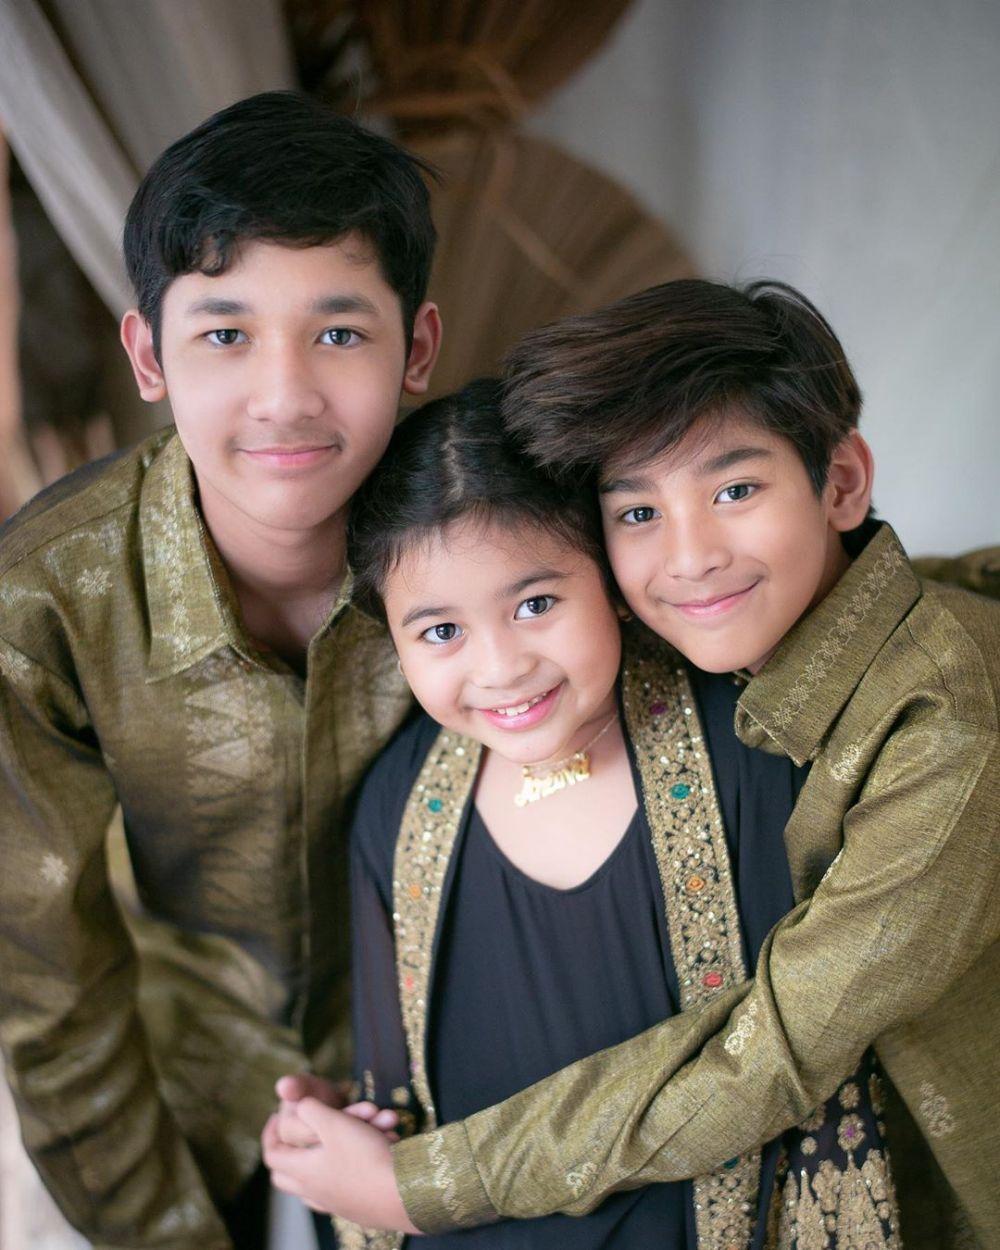 11 Foto Keluarga Andre Taulany Saat Pemotretan, Bahagia Banget!